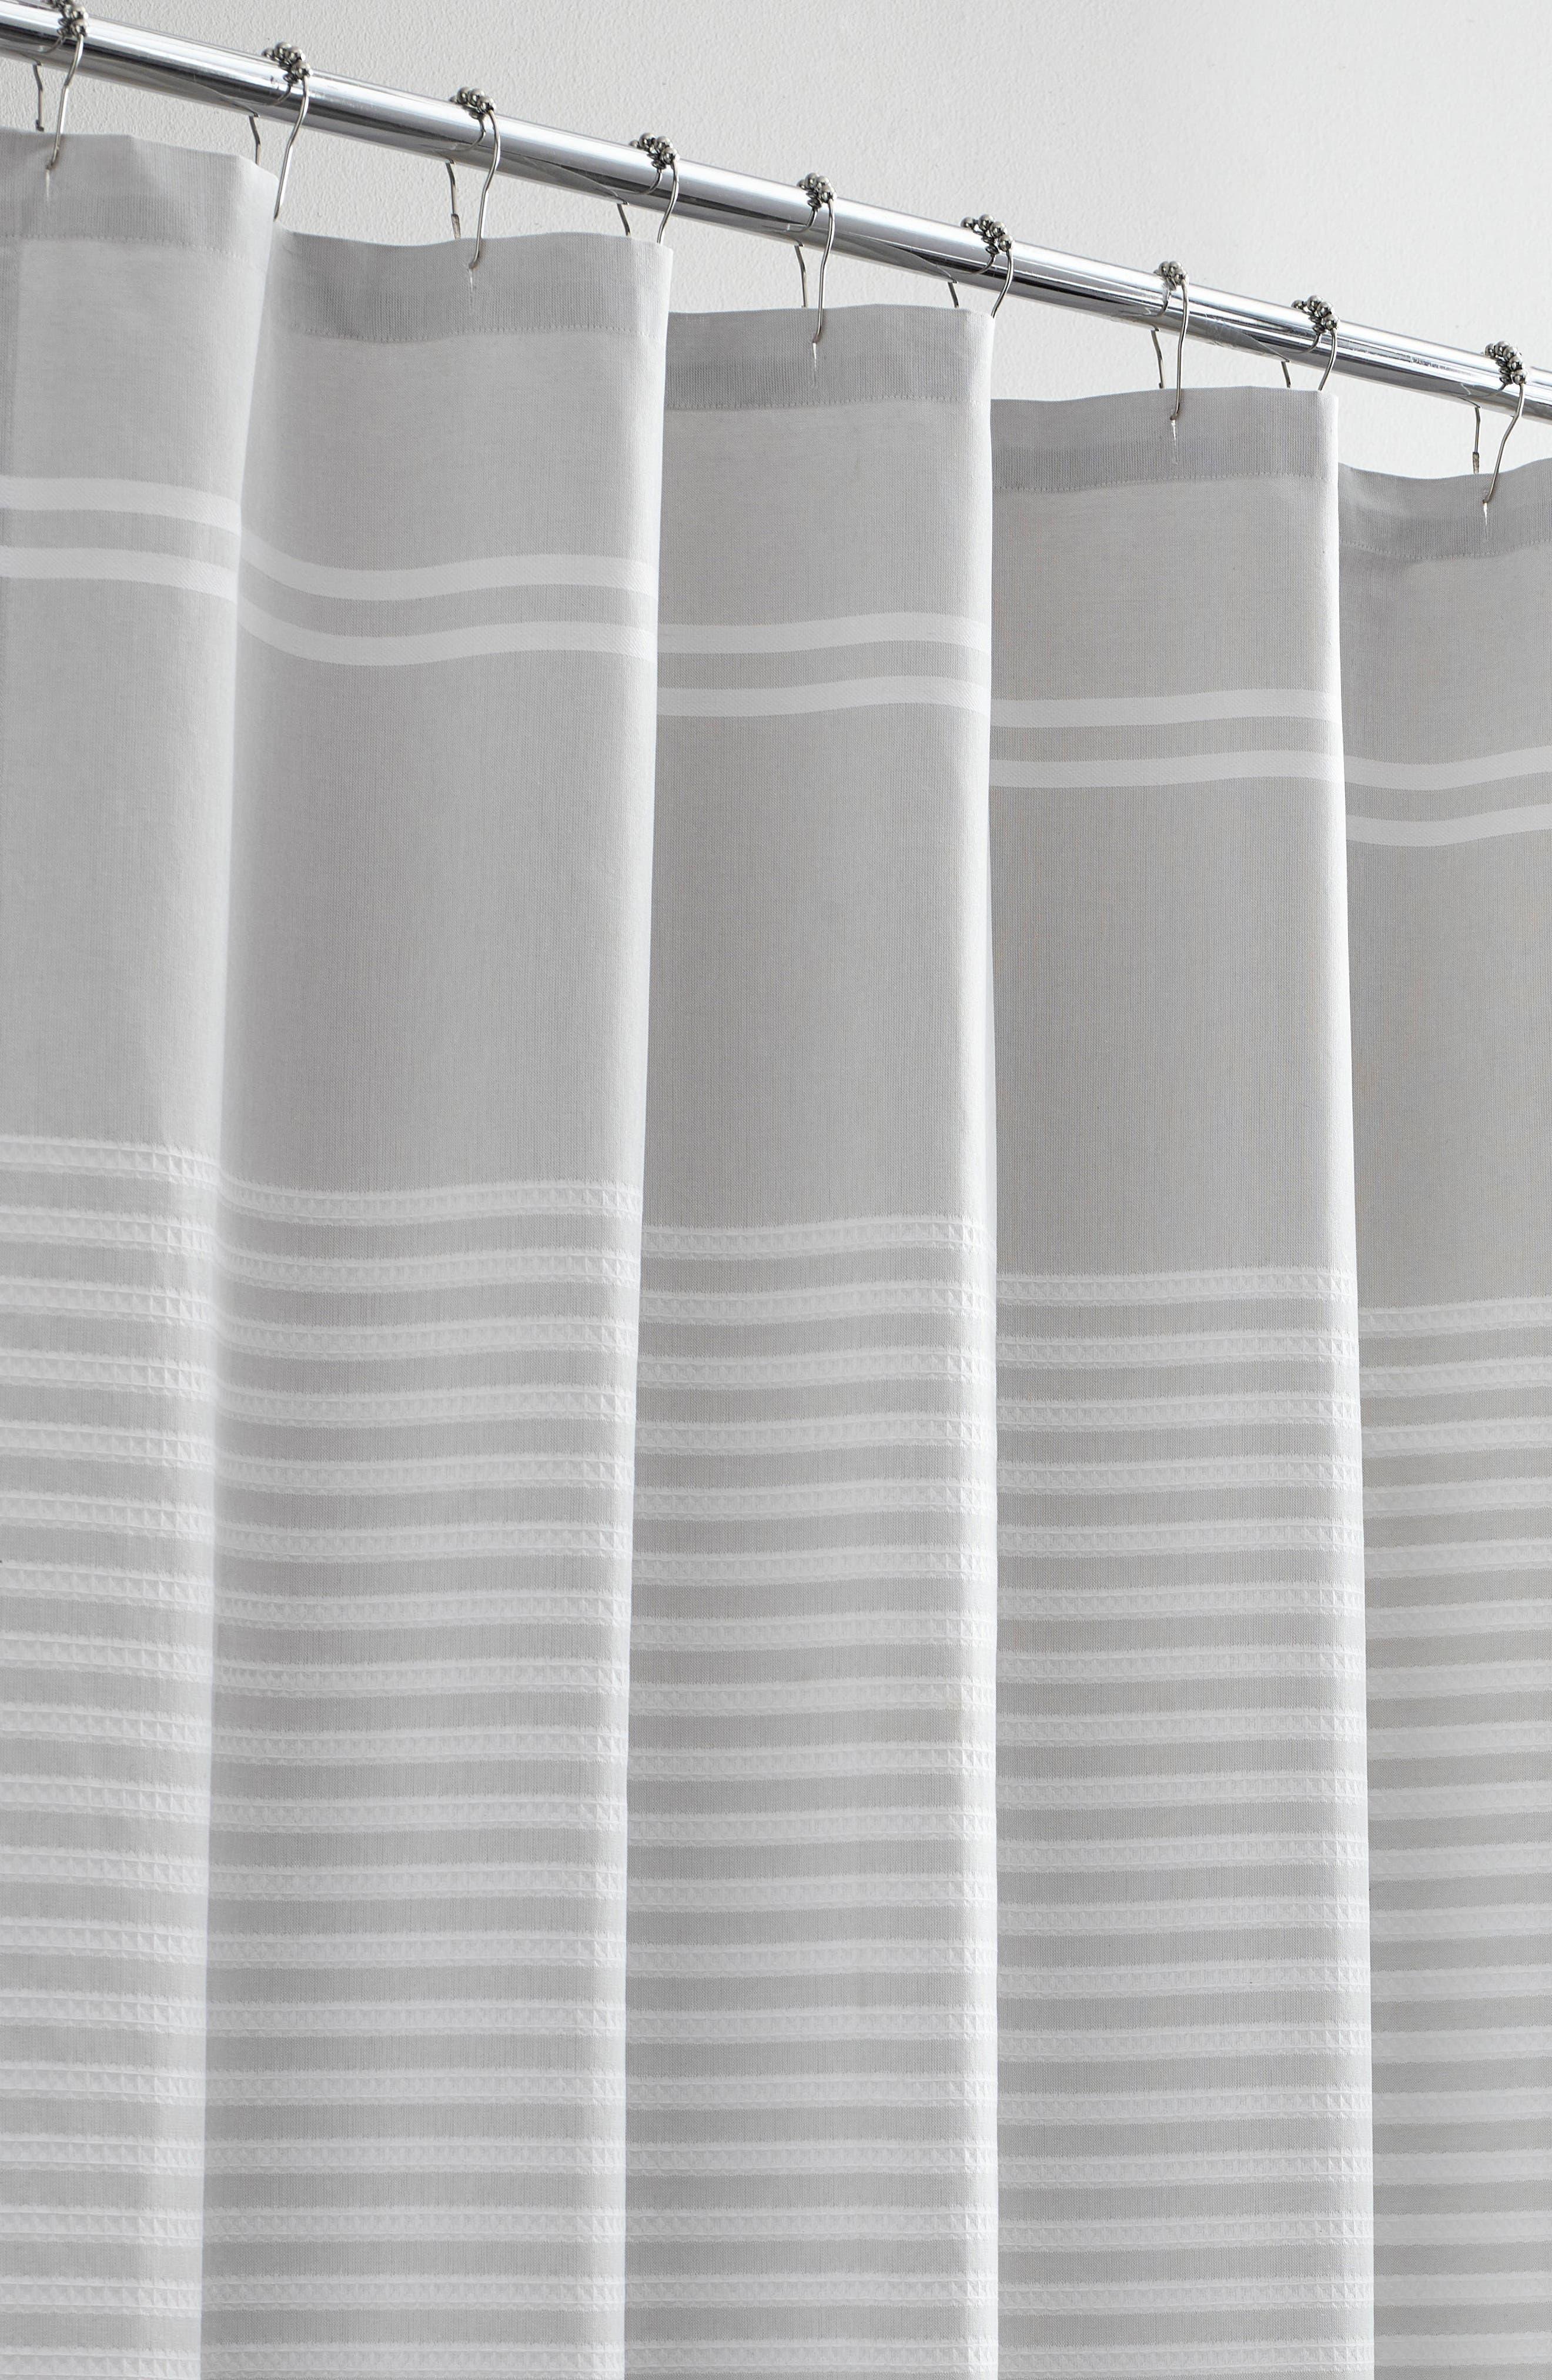 VERA WANG,                             Seersucker Stripe Shower Curtain,                             Alternate thumbnail 2, color,                             AQUARMARINE/ WHITE